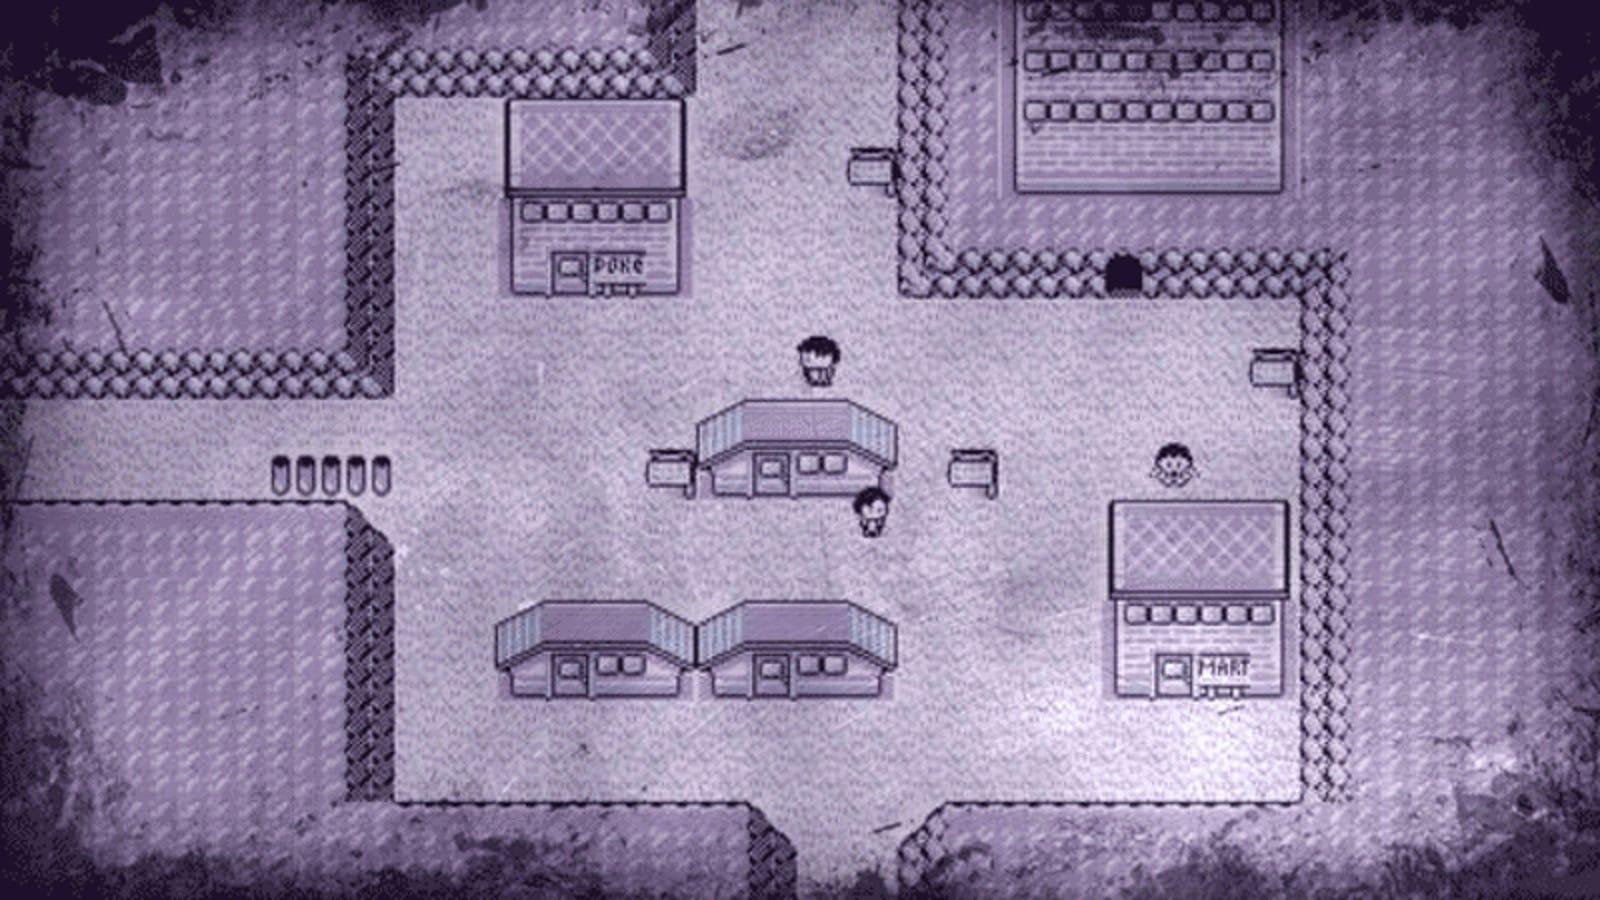 Pokémons Creepy Lavender Town Myth Explained